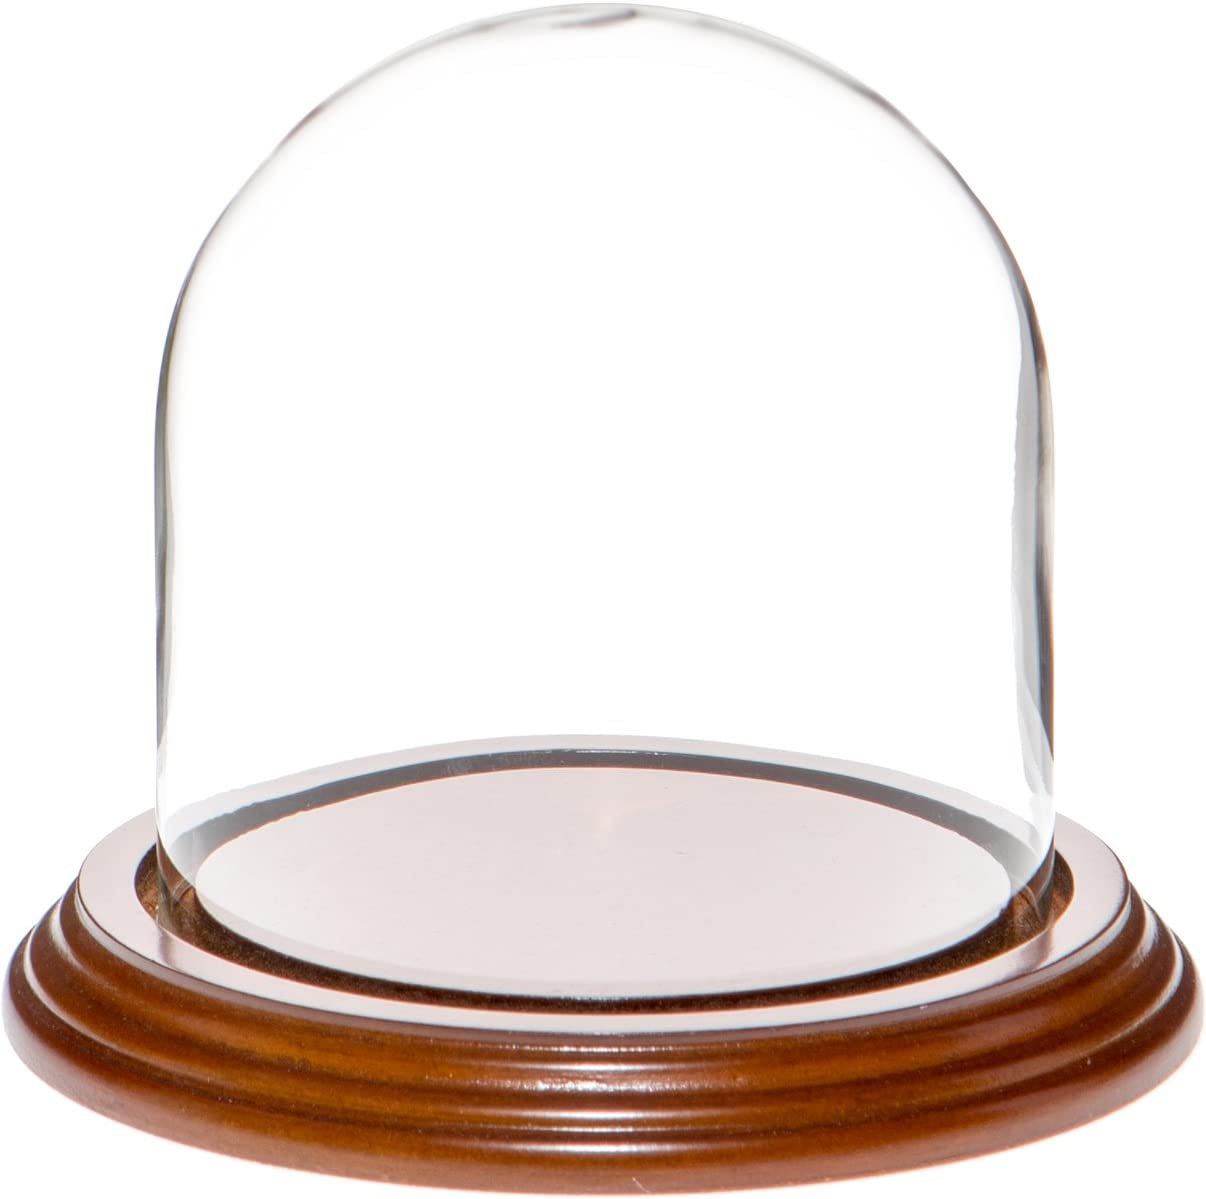 "Plymor 4"" x 4"" Glass Display Dome Cloche (Walnut Veneer Base)"